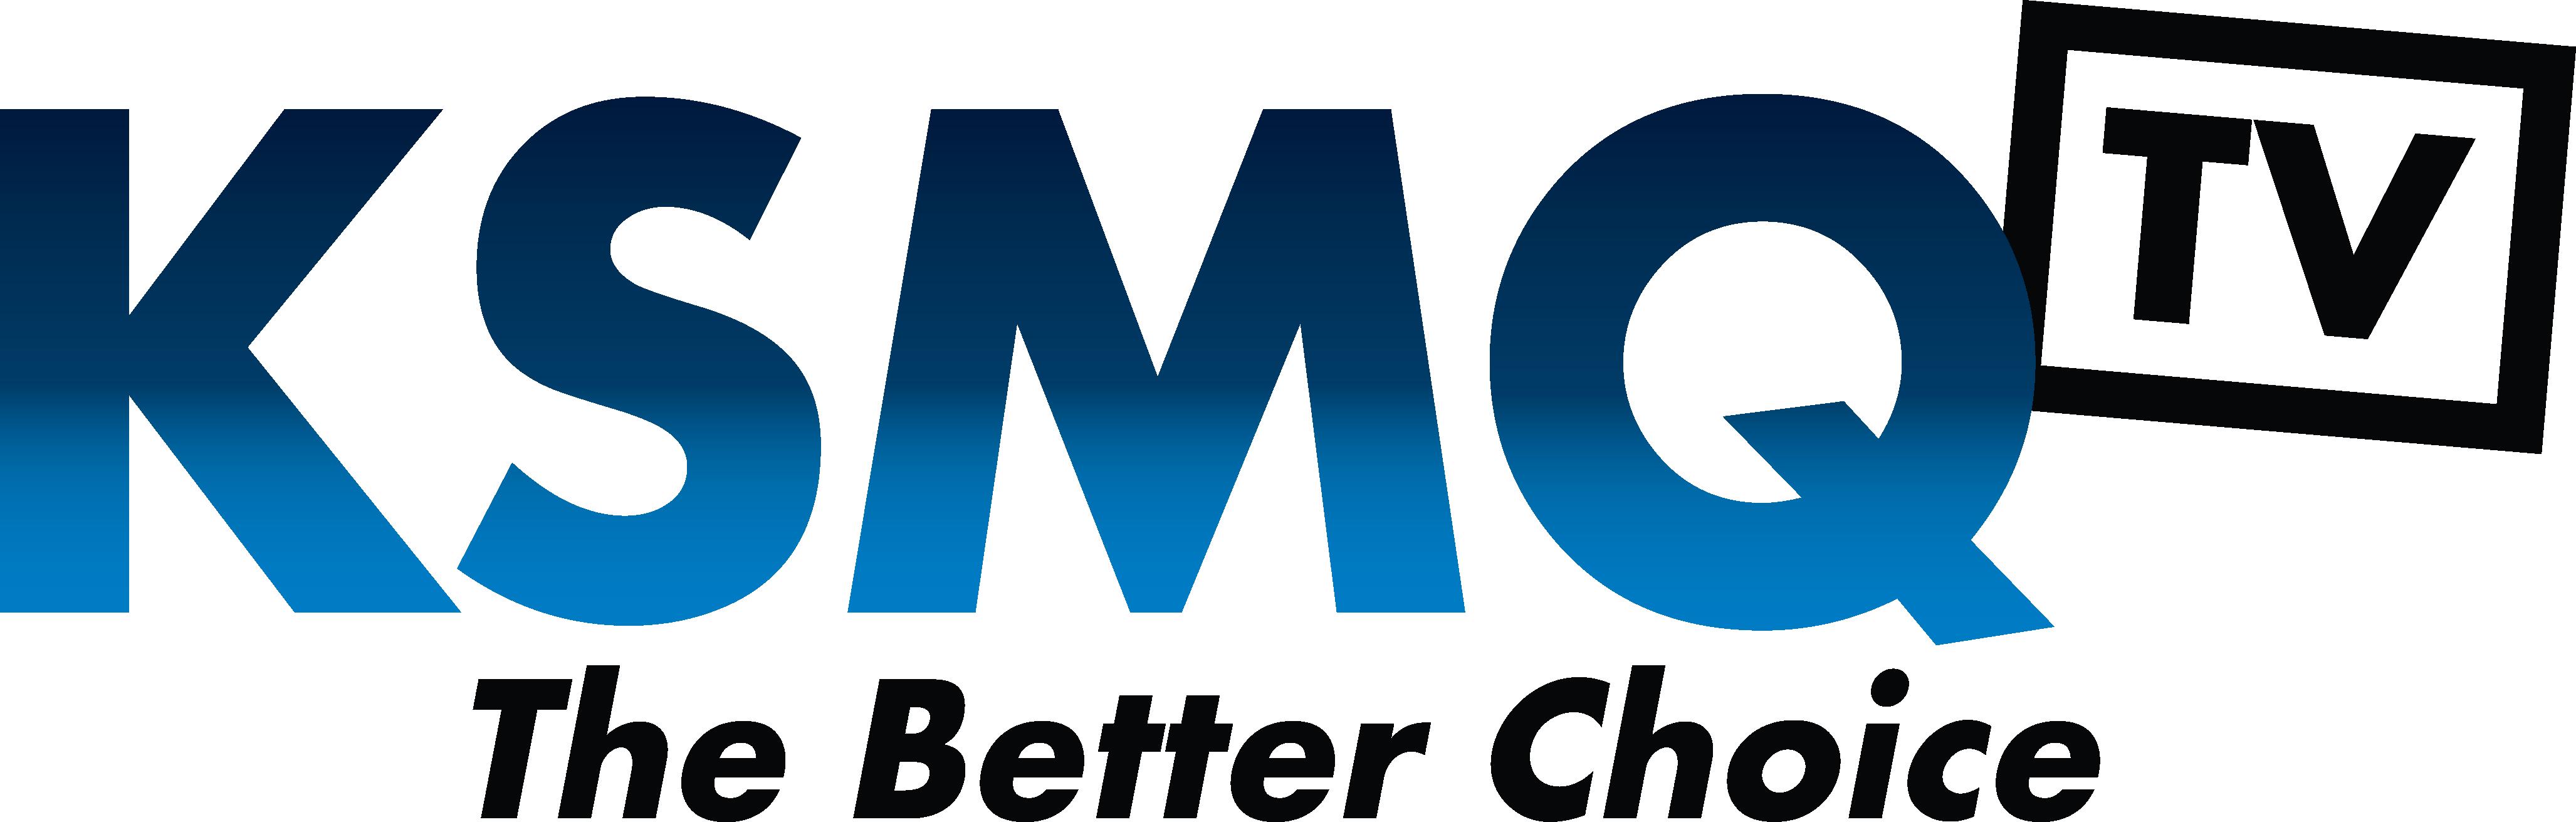 KSMQ Public Service Media, Inc.